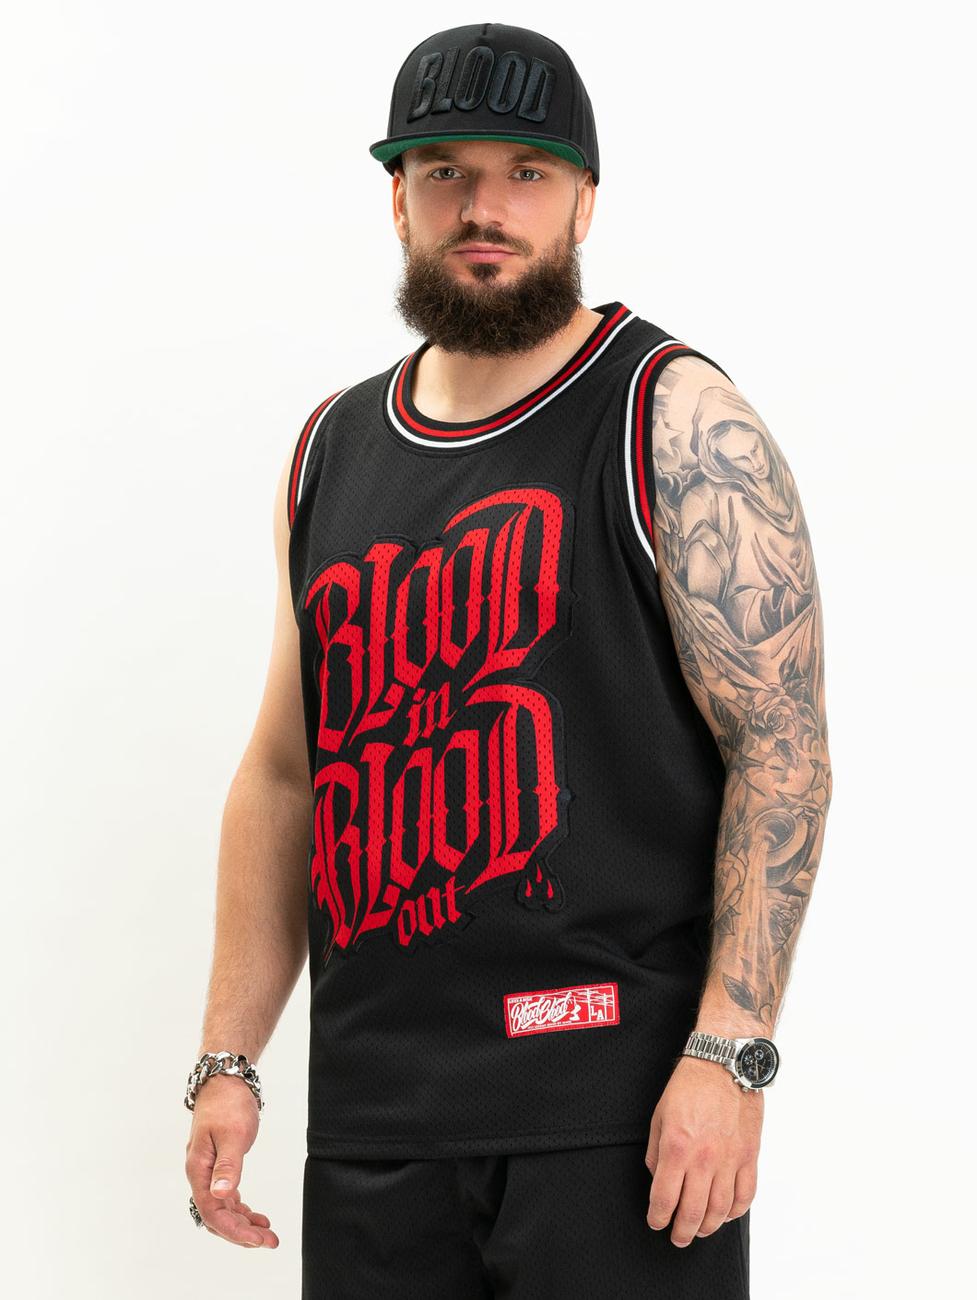 Blood In Blood Out Aguas Mesh Tanktop 3XL